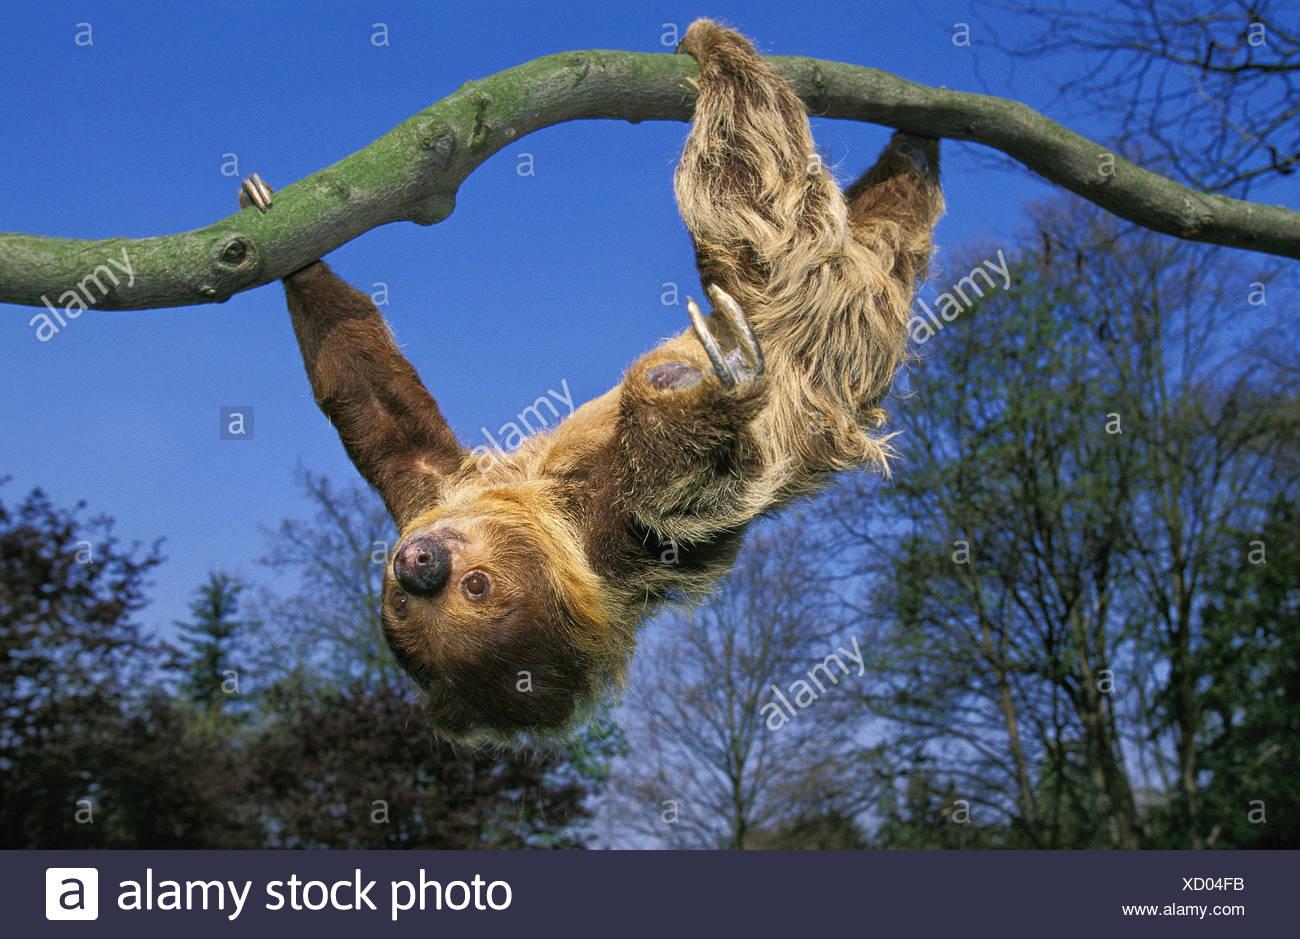 2 finger sloth,Choloepus didactylus,adult animal,hang,branch, - Stock Image